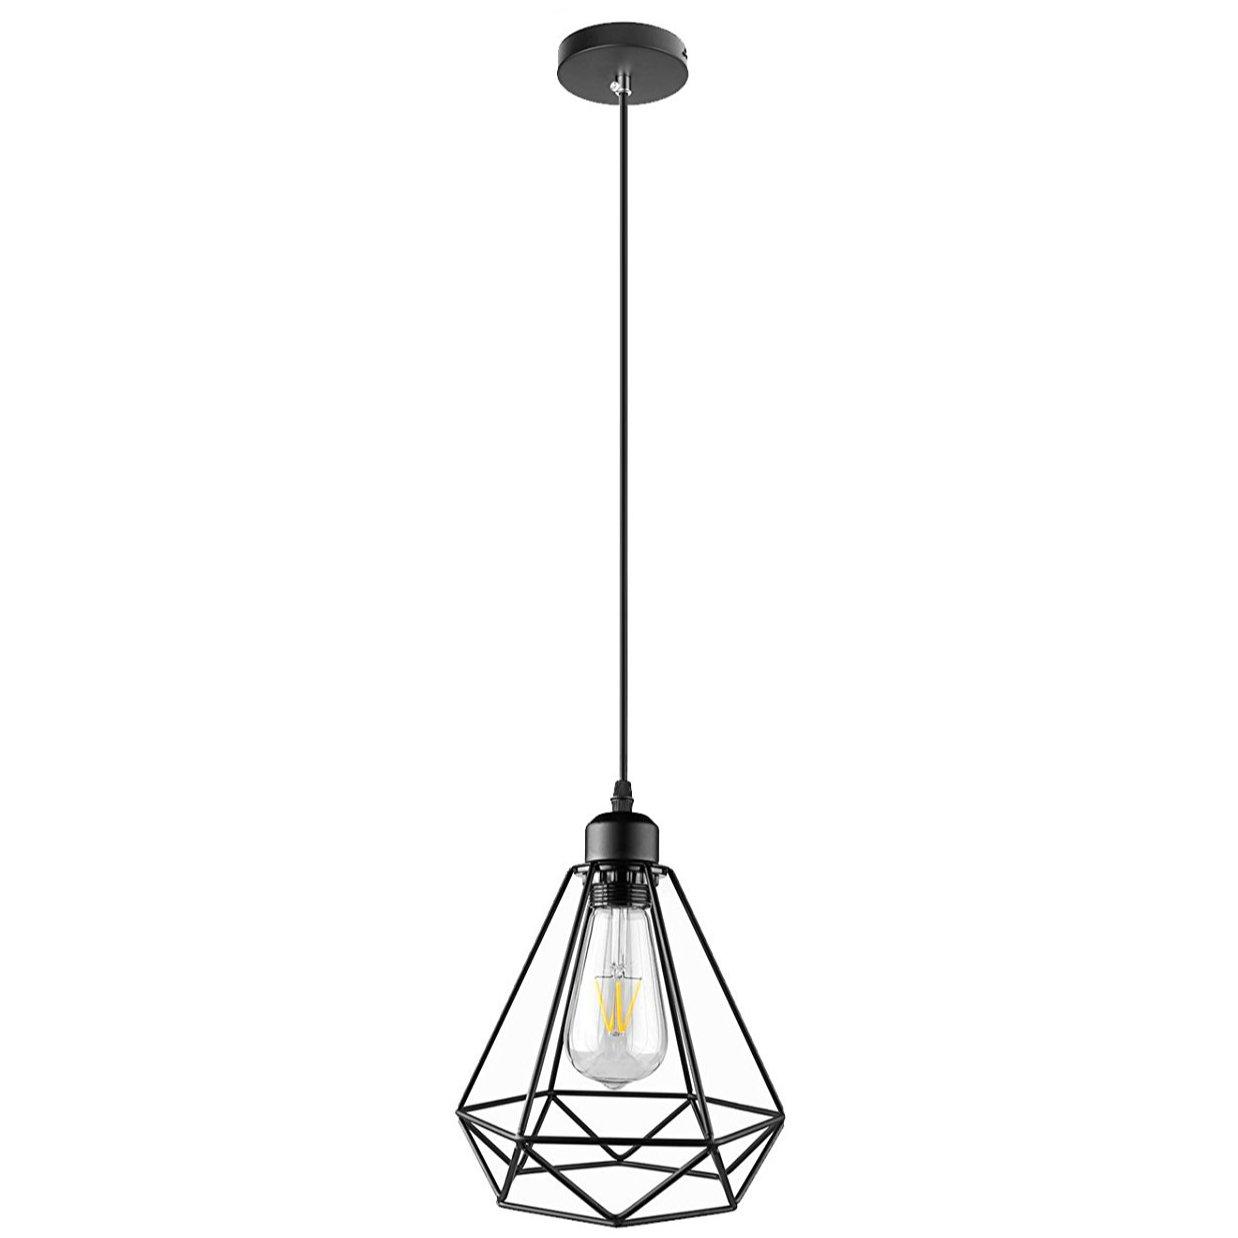 Lightess Hanging Pendant Lights Industrial Edison Barn Light Diamond Cage Black Farmhouse Ceiling Lighting Fixture 1-Light